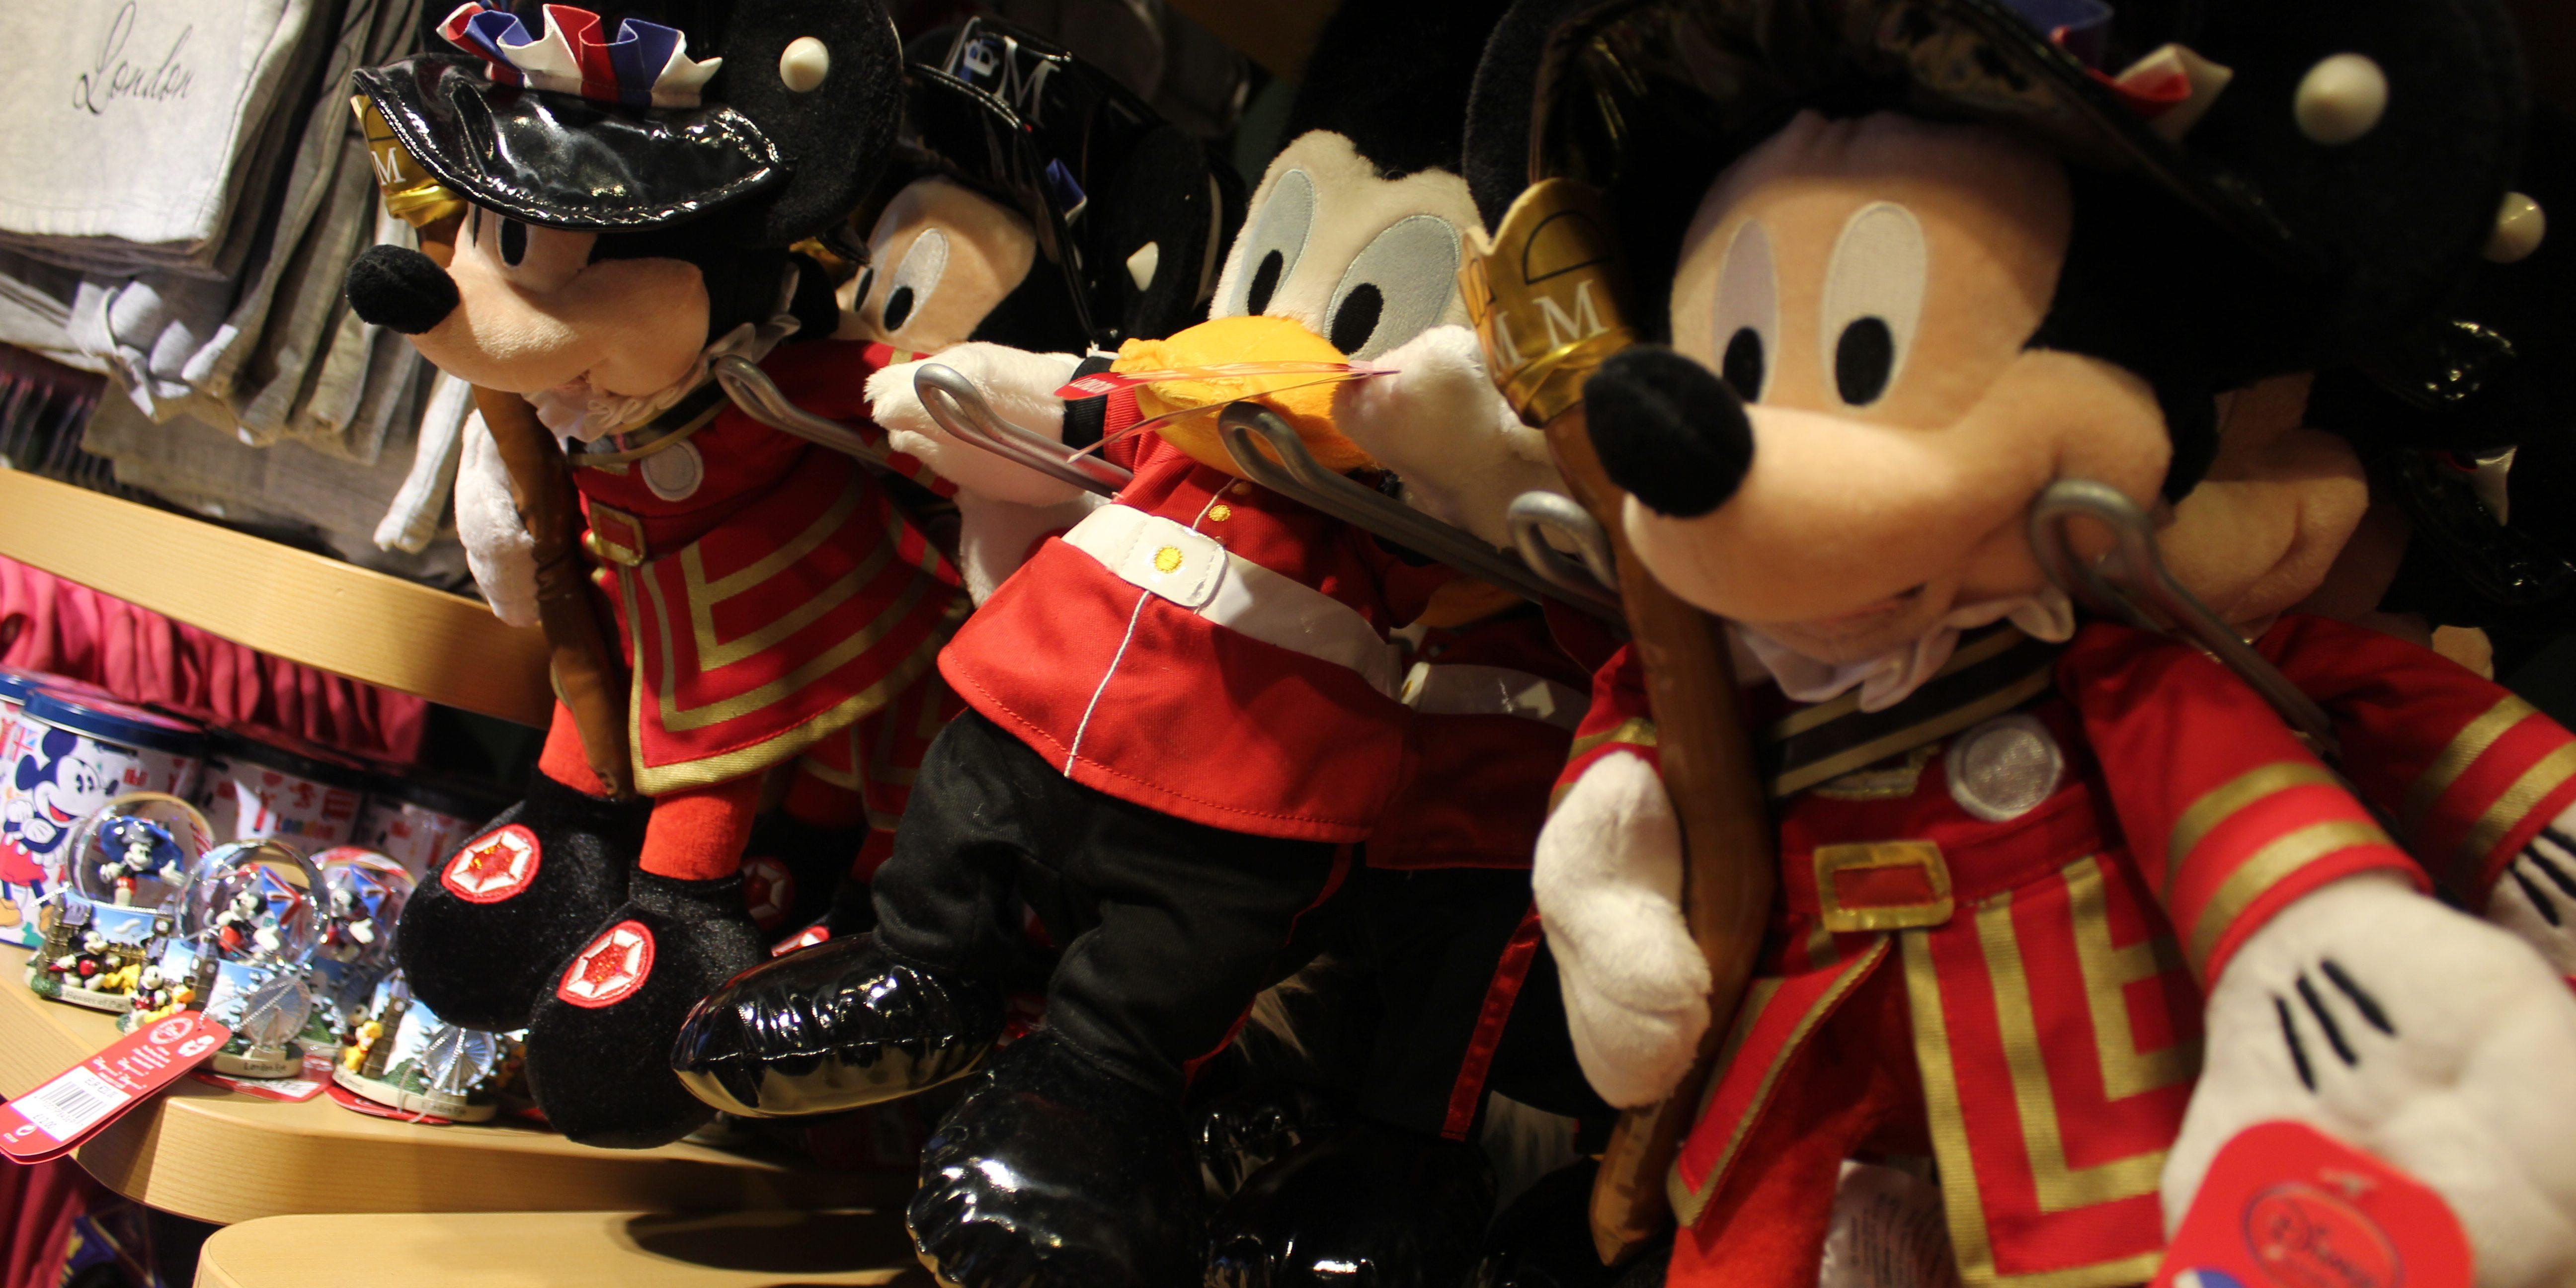 take a visit to disney store on oxford street  london 25th Anniversary Disneyland Paris Disney World 25th